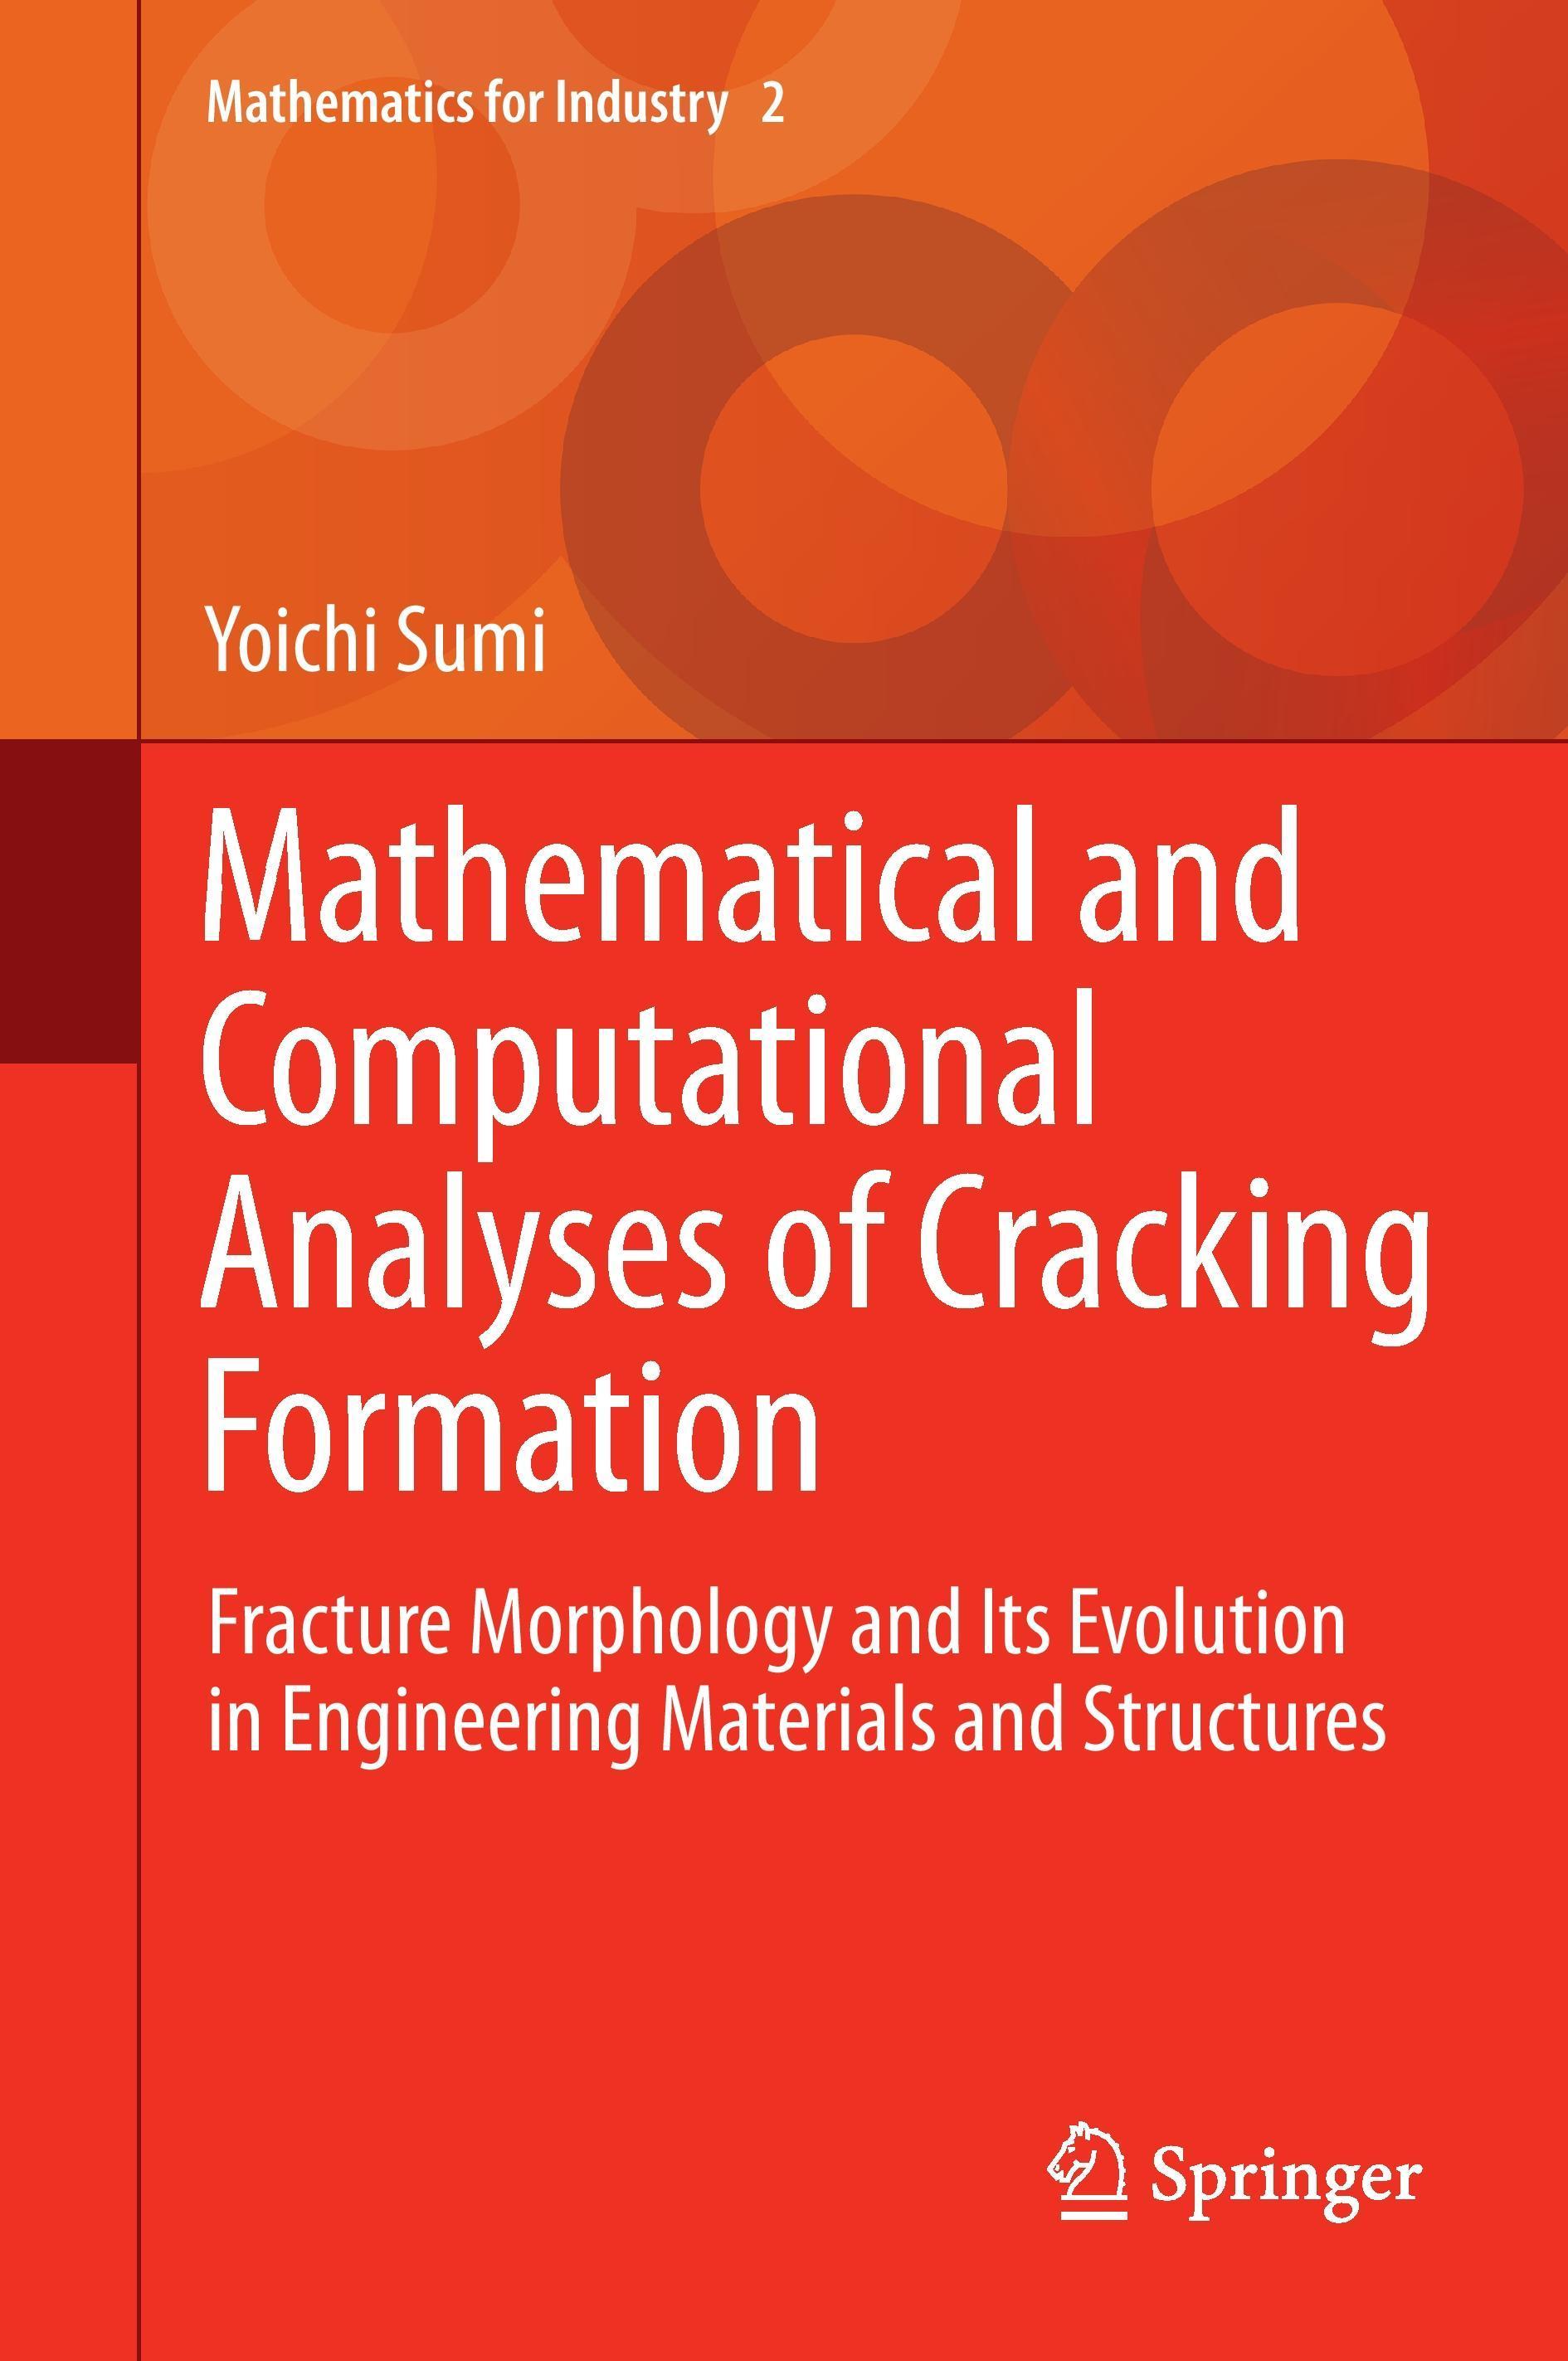 Mathematical and Computational Analyses of Cracking Formation Sumi, Yoichi Mat..